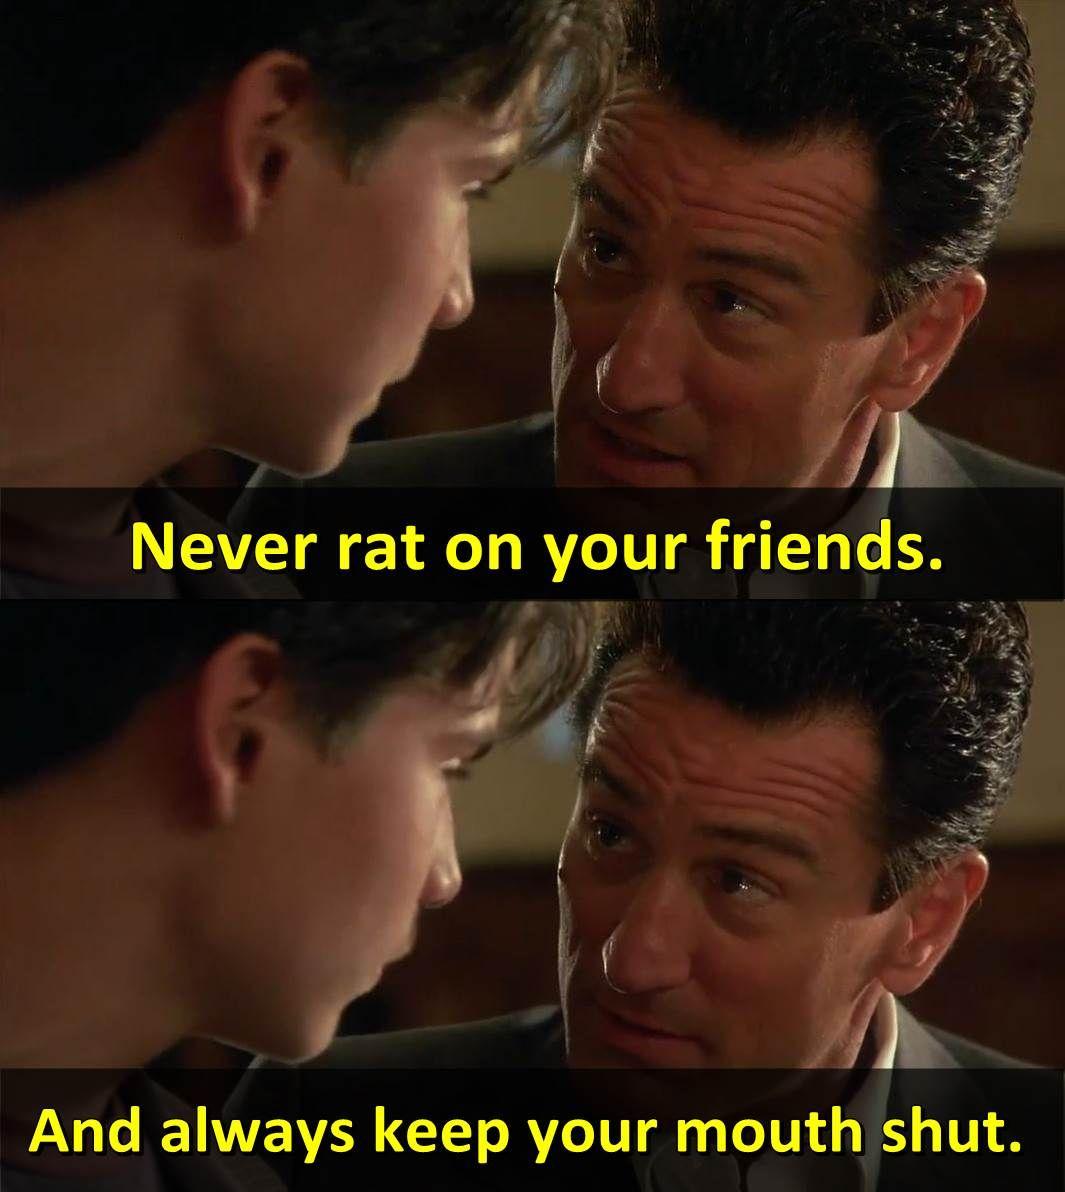 Goodfellas 1990 Robert De Niro Joe Pesci Ray Liotta Dir Martin Scorsese Goodfellas Movie Best Movie Lines Favorite Movie Quotes